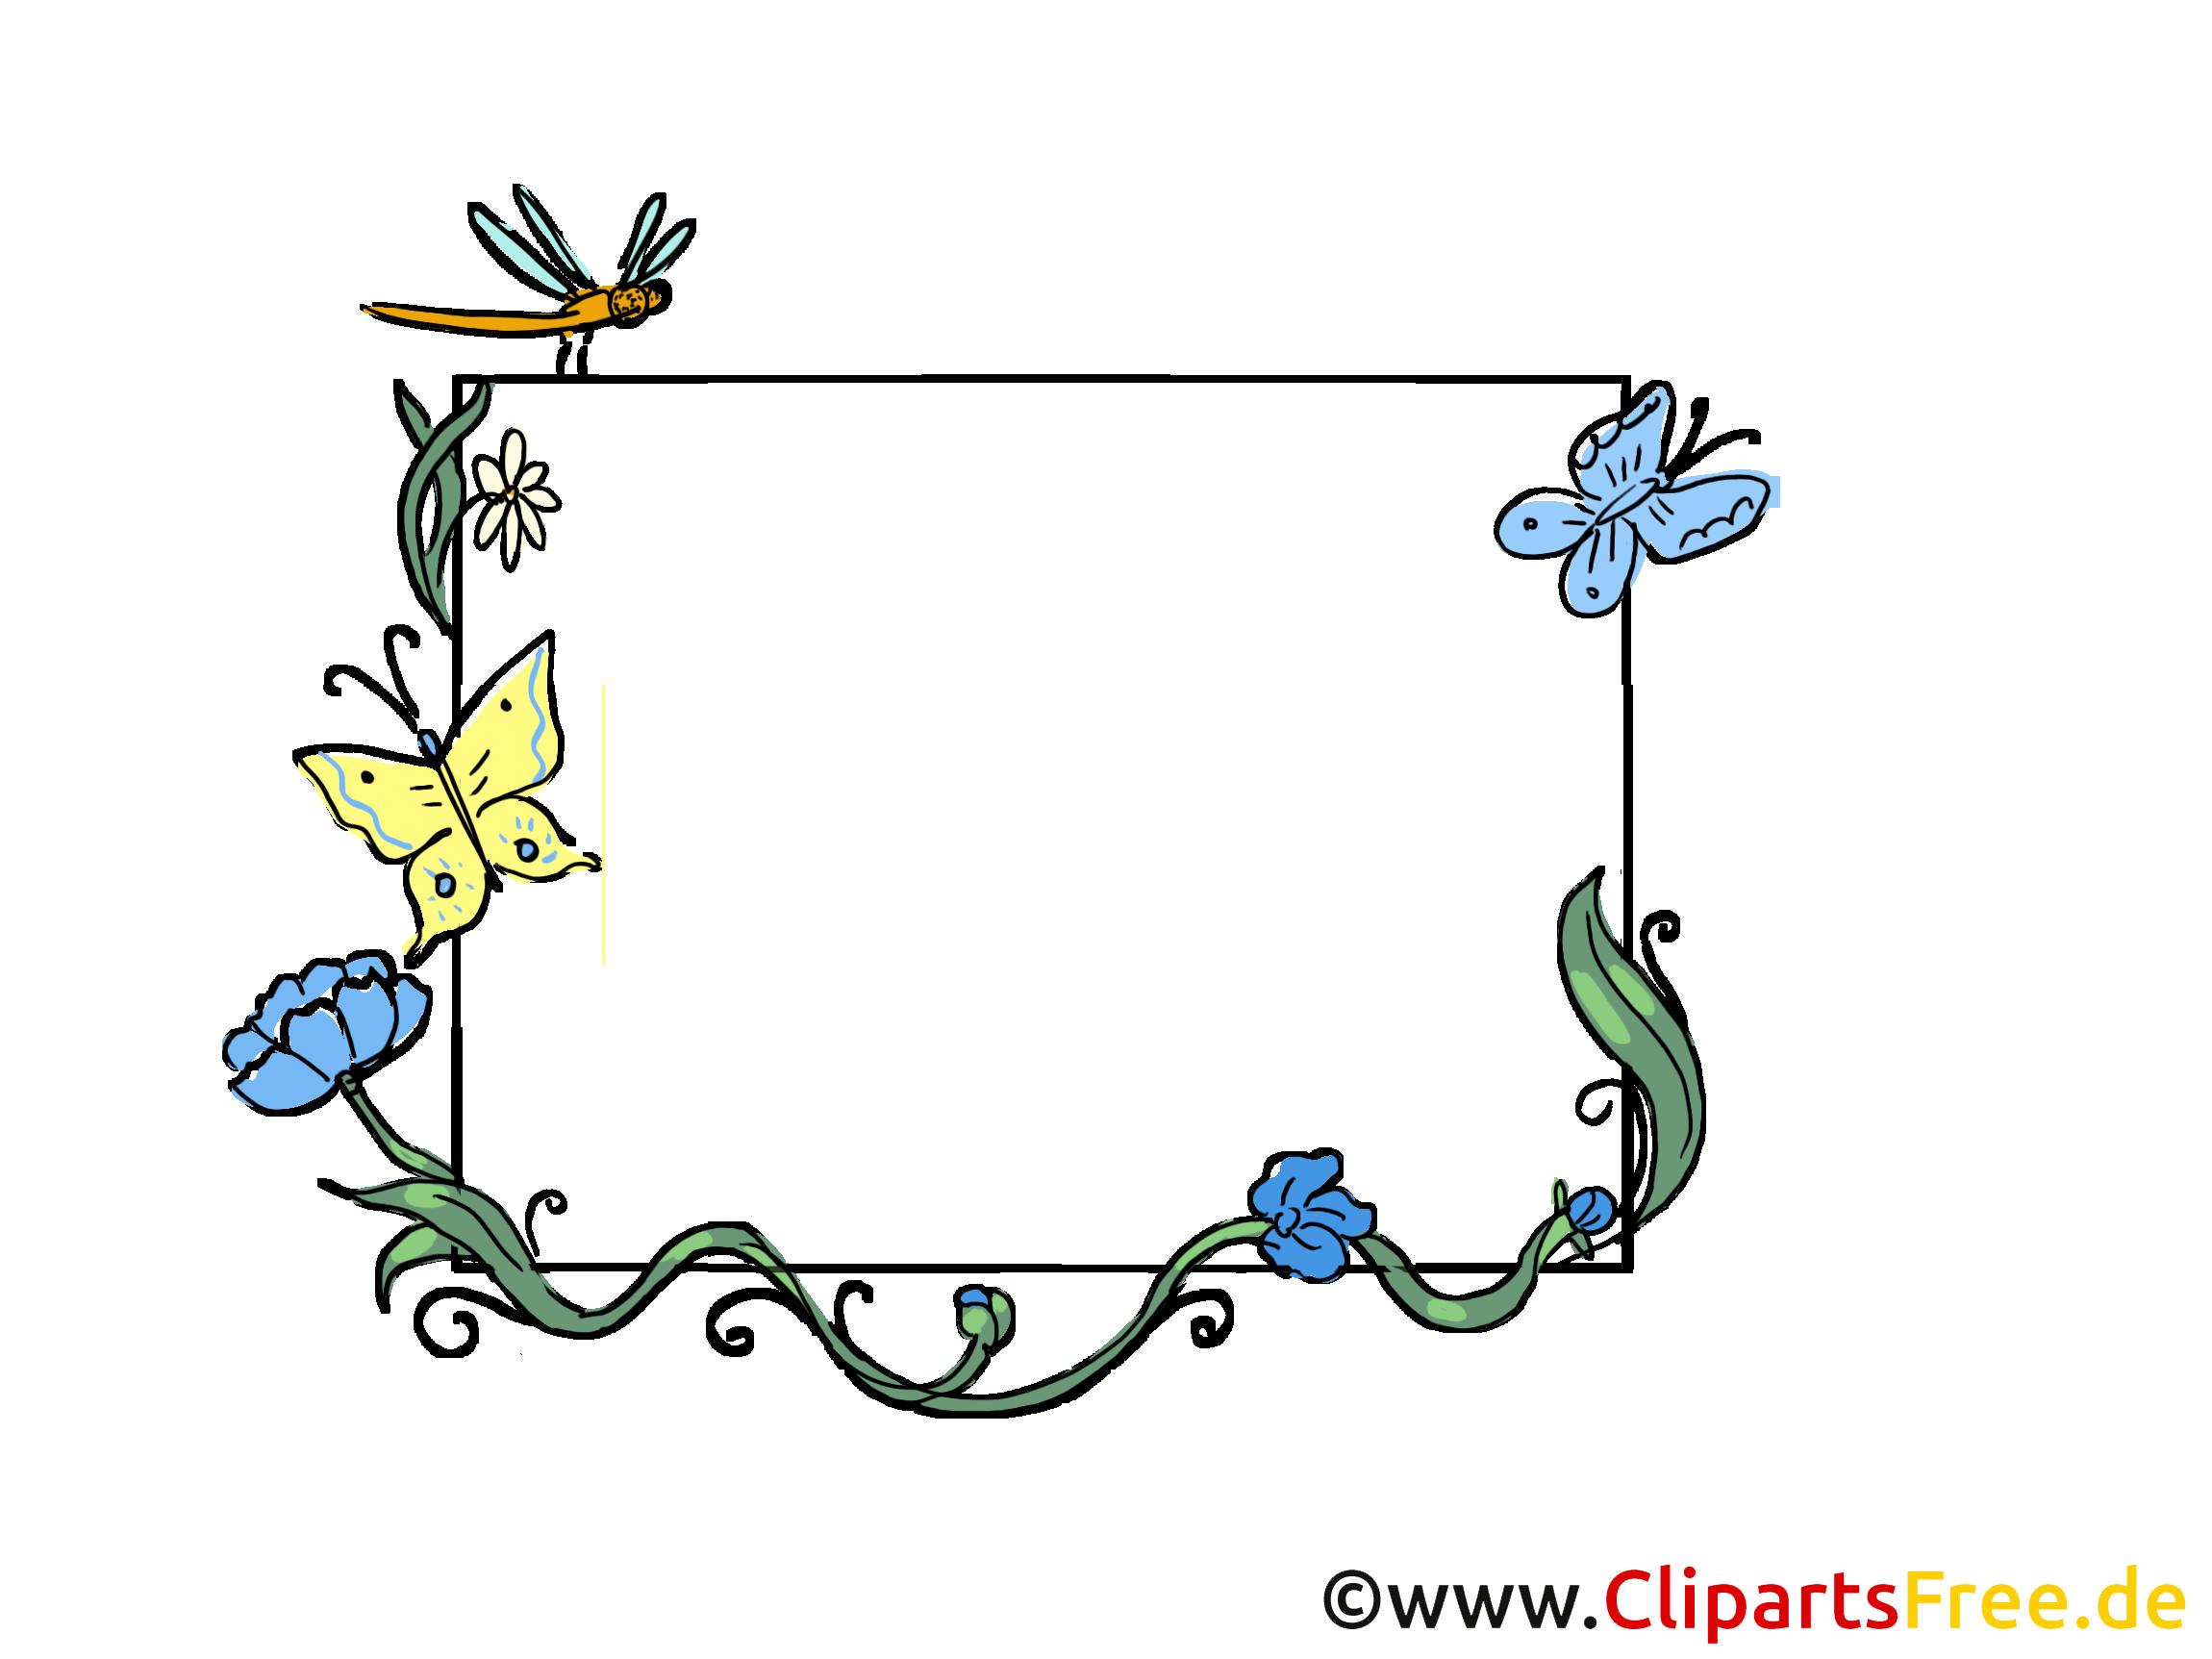 Einladung geburtstag clipart clip art royalty free Rahmen Bilder, Cliparts, Cartoons, Grafiken, Illustrationen, Gifs ... clip art royalty free